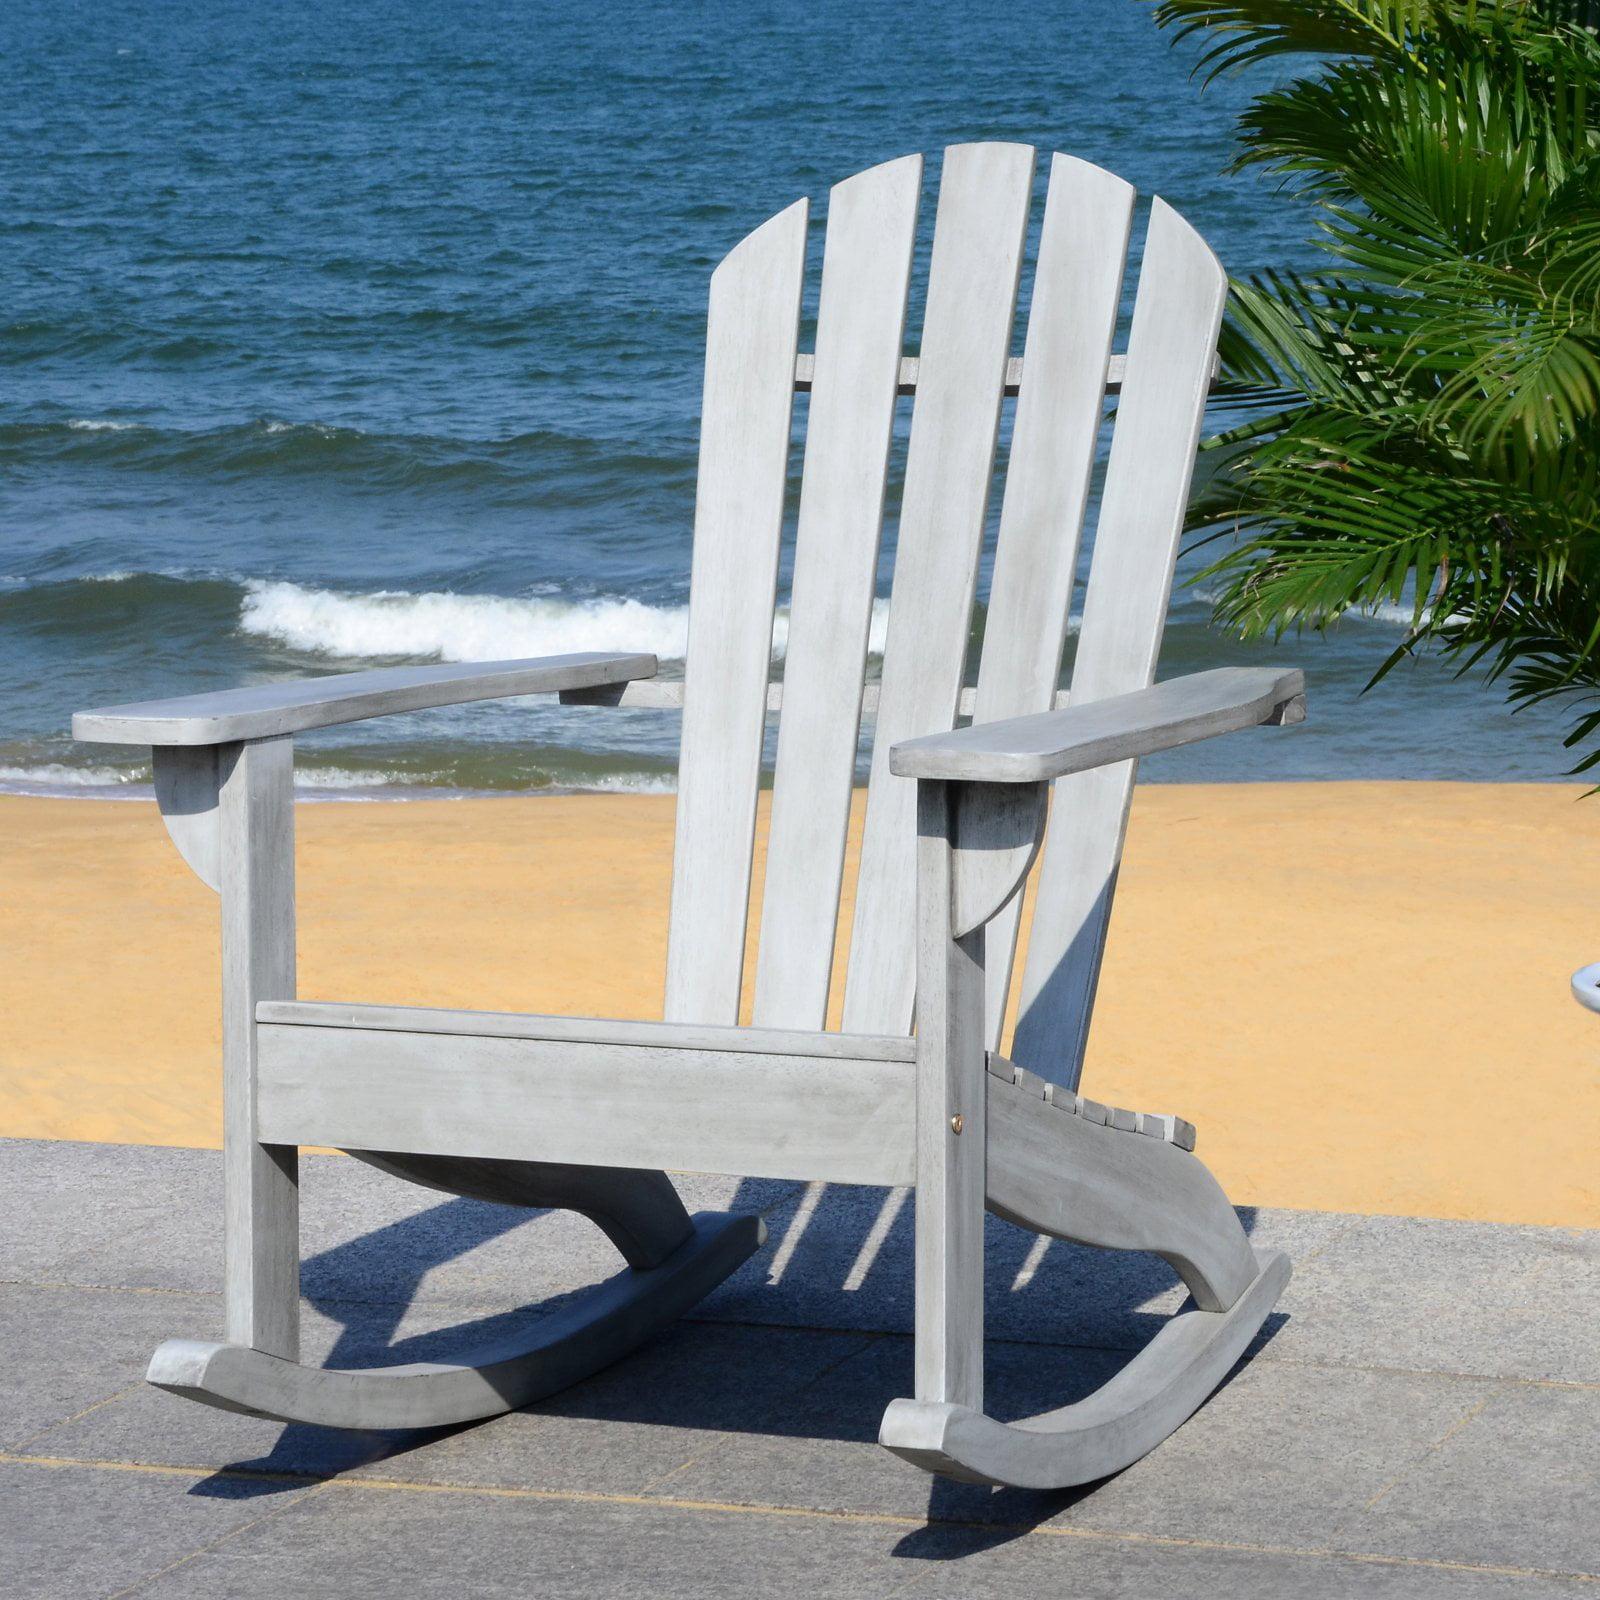 Safavieh Brizio Outdoor Adirondack Slat Back Rocking Chair